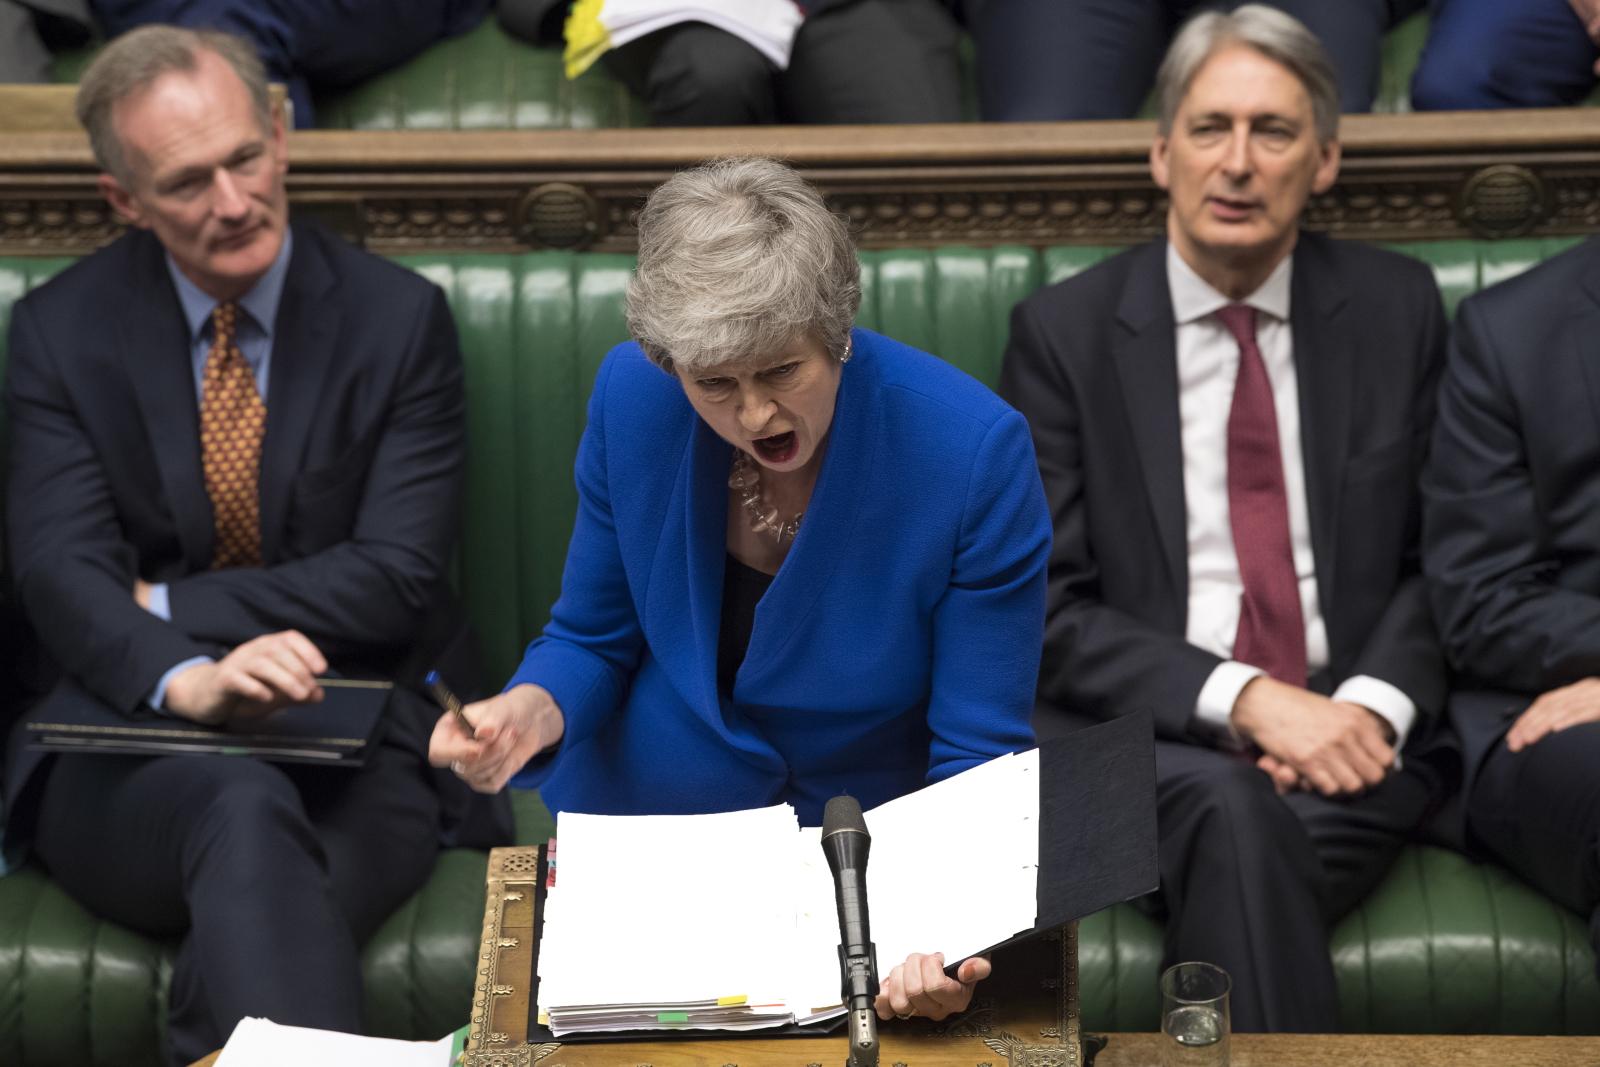 Brytyjska premier Theresa May w parlamencie, Londyn. Fot. PAP/EPA/MARK DUFFY / UK PARLIAMENT